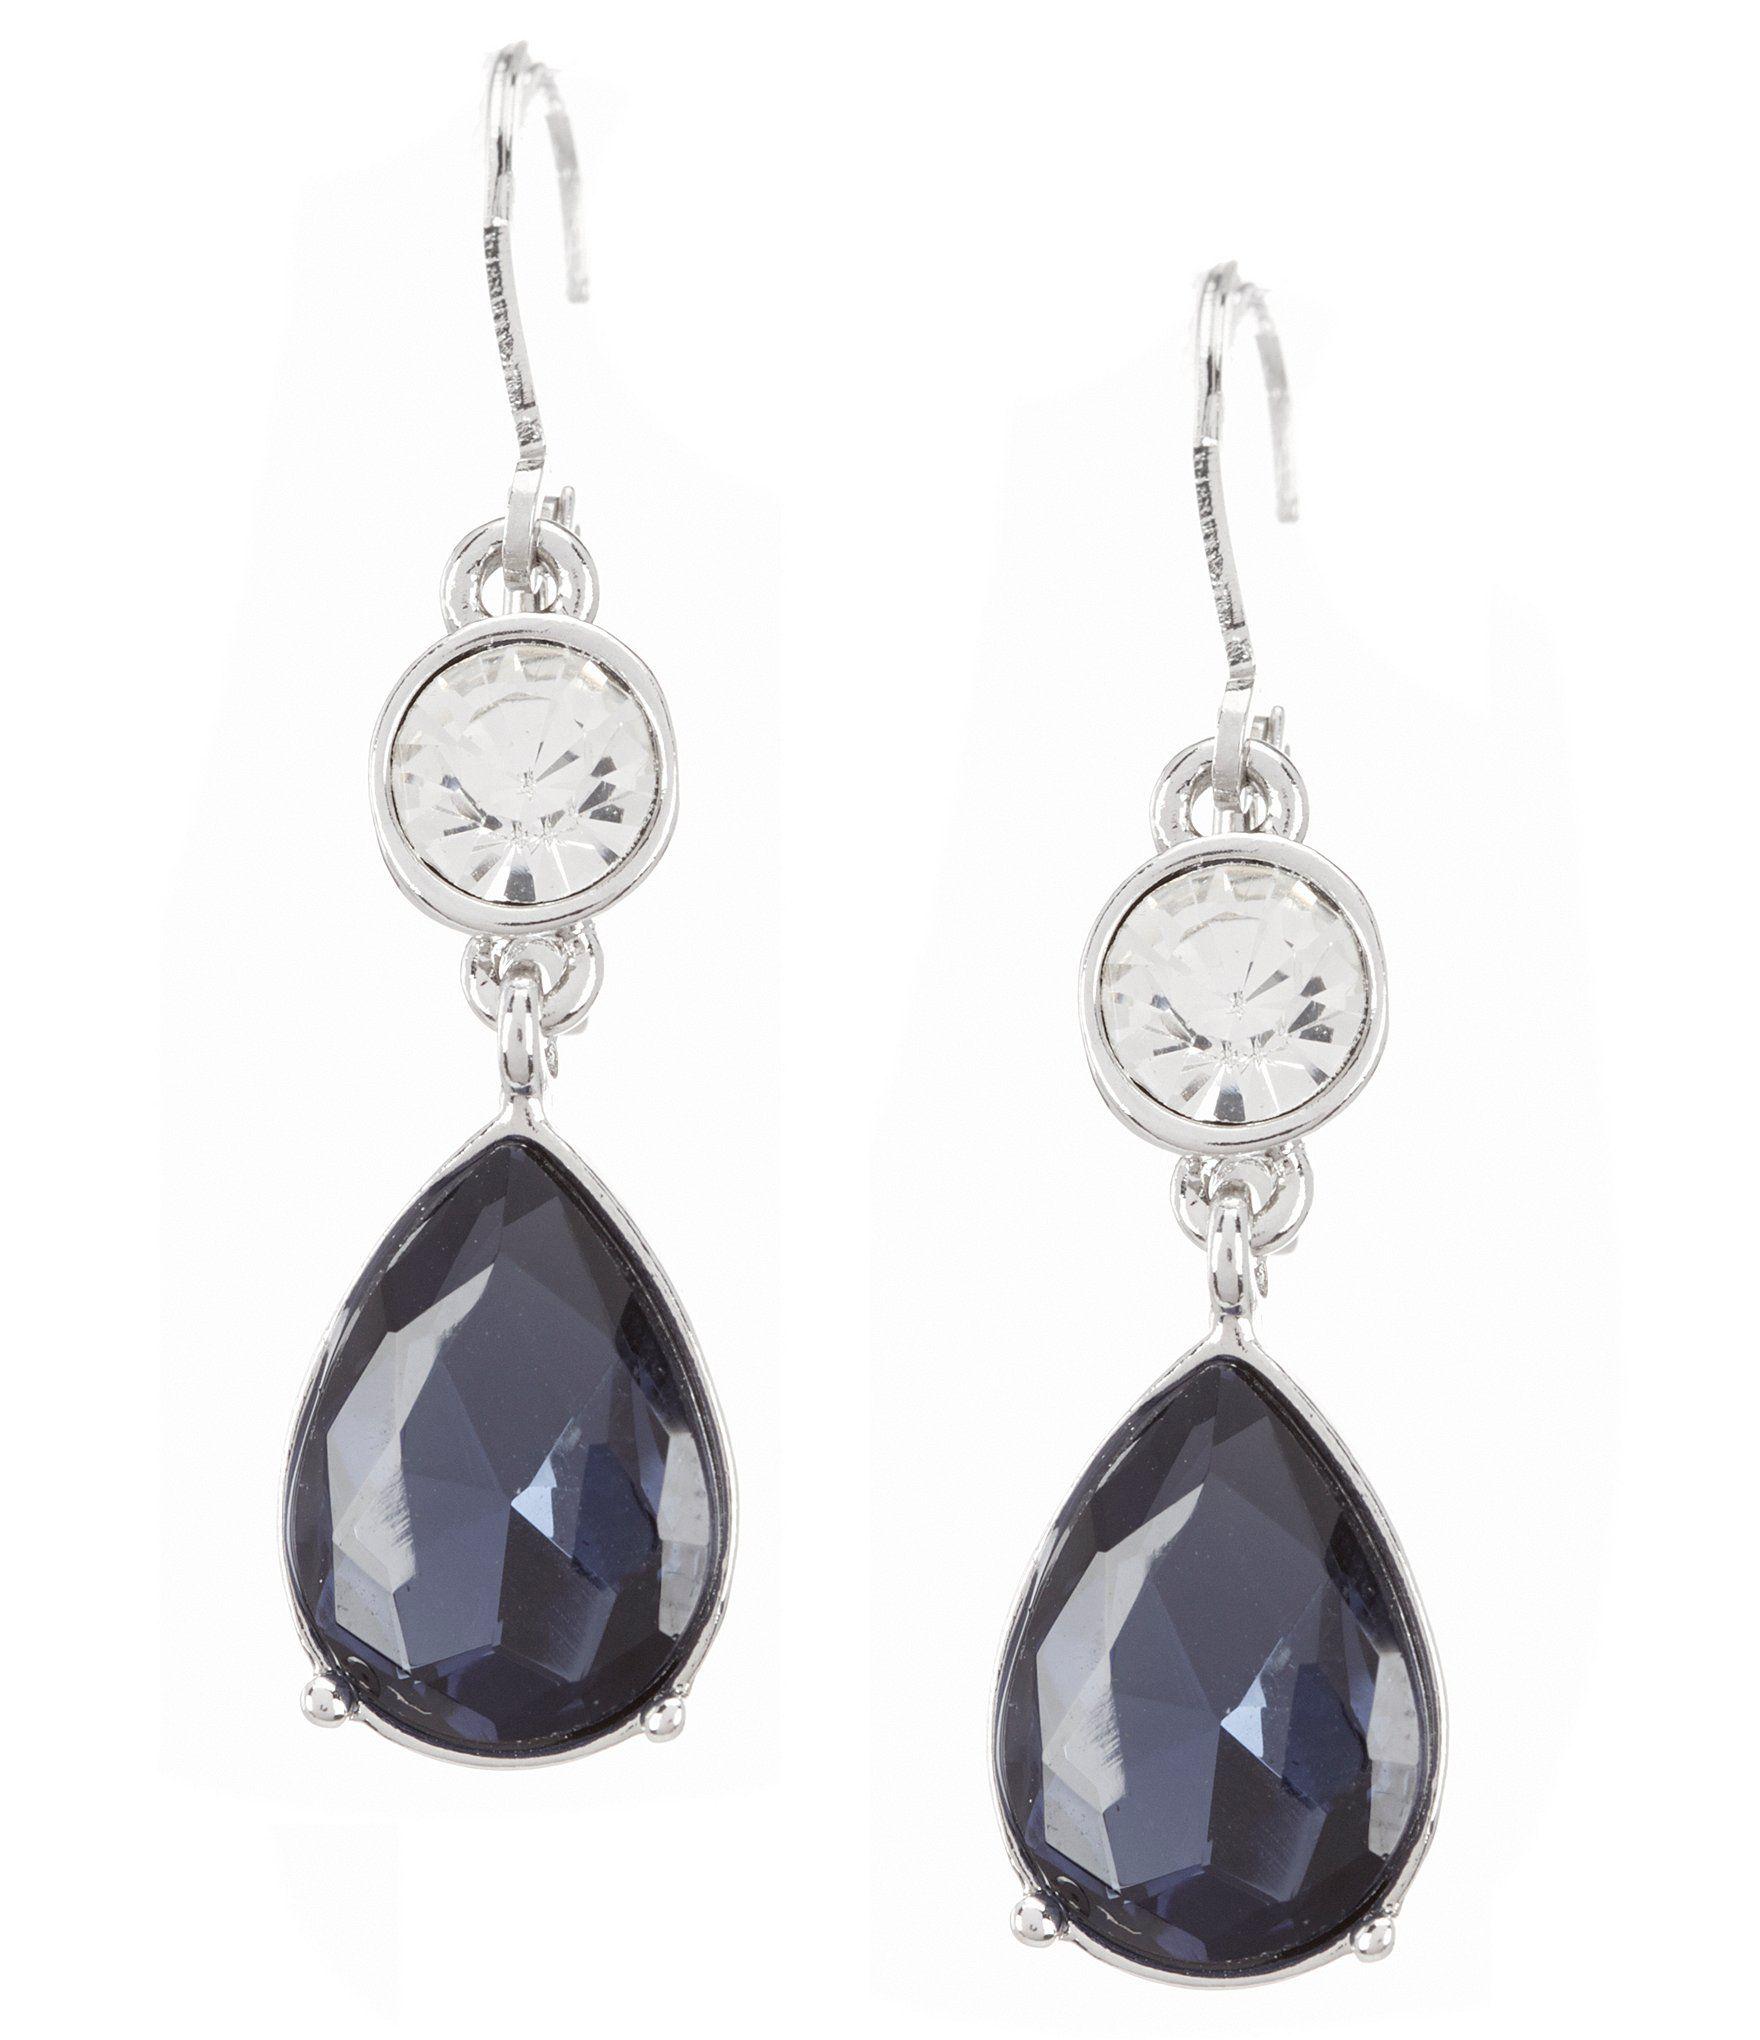 03872783f Shop for Gemma Layne Montana Drop Earrings at Dillards.com. Visit Dillards .com